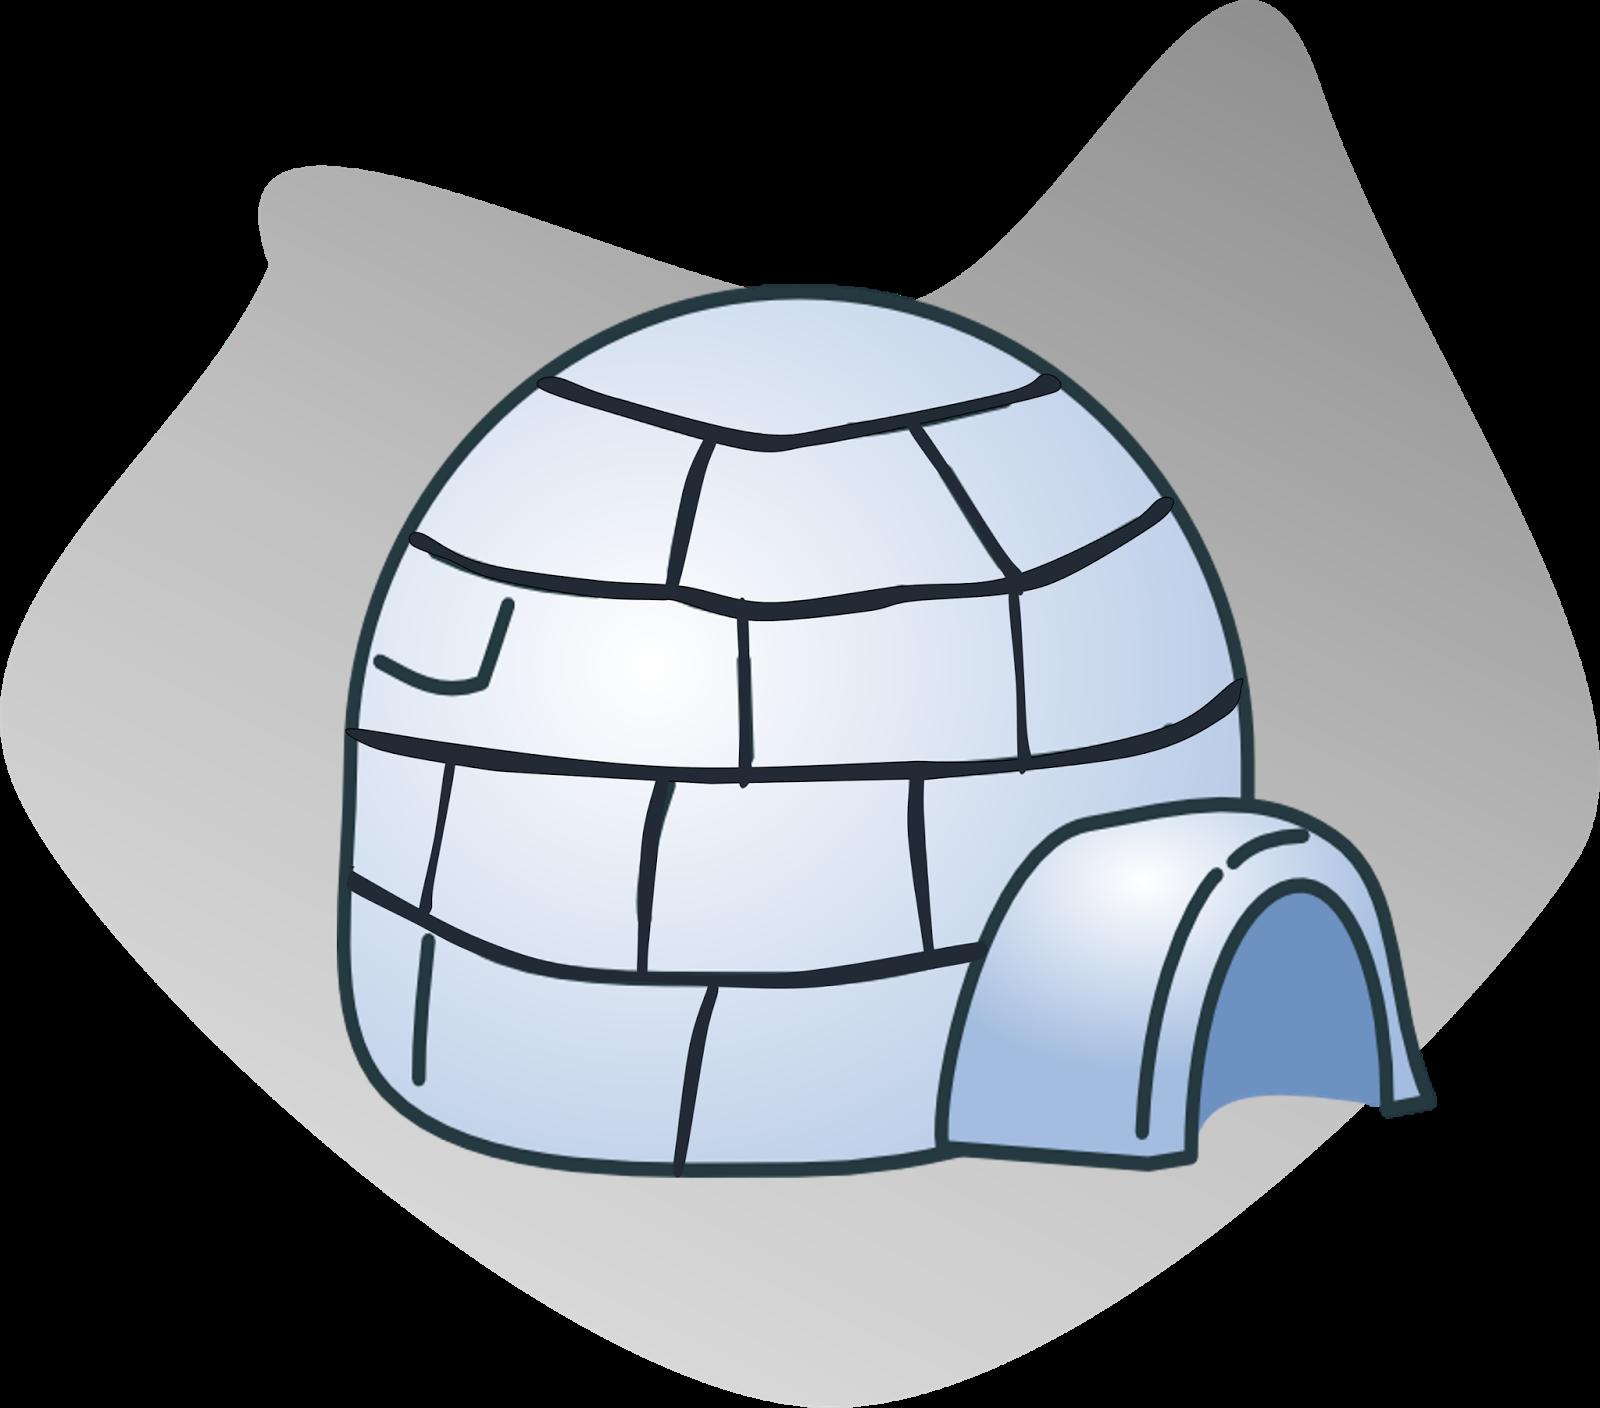 Igloo Clipart-Igloo Clipart-16